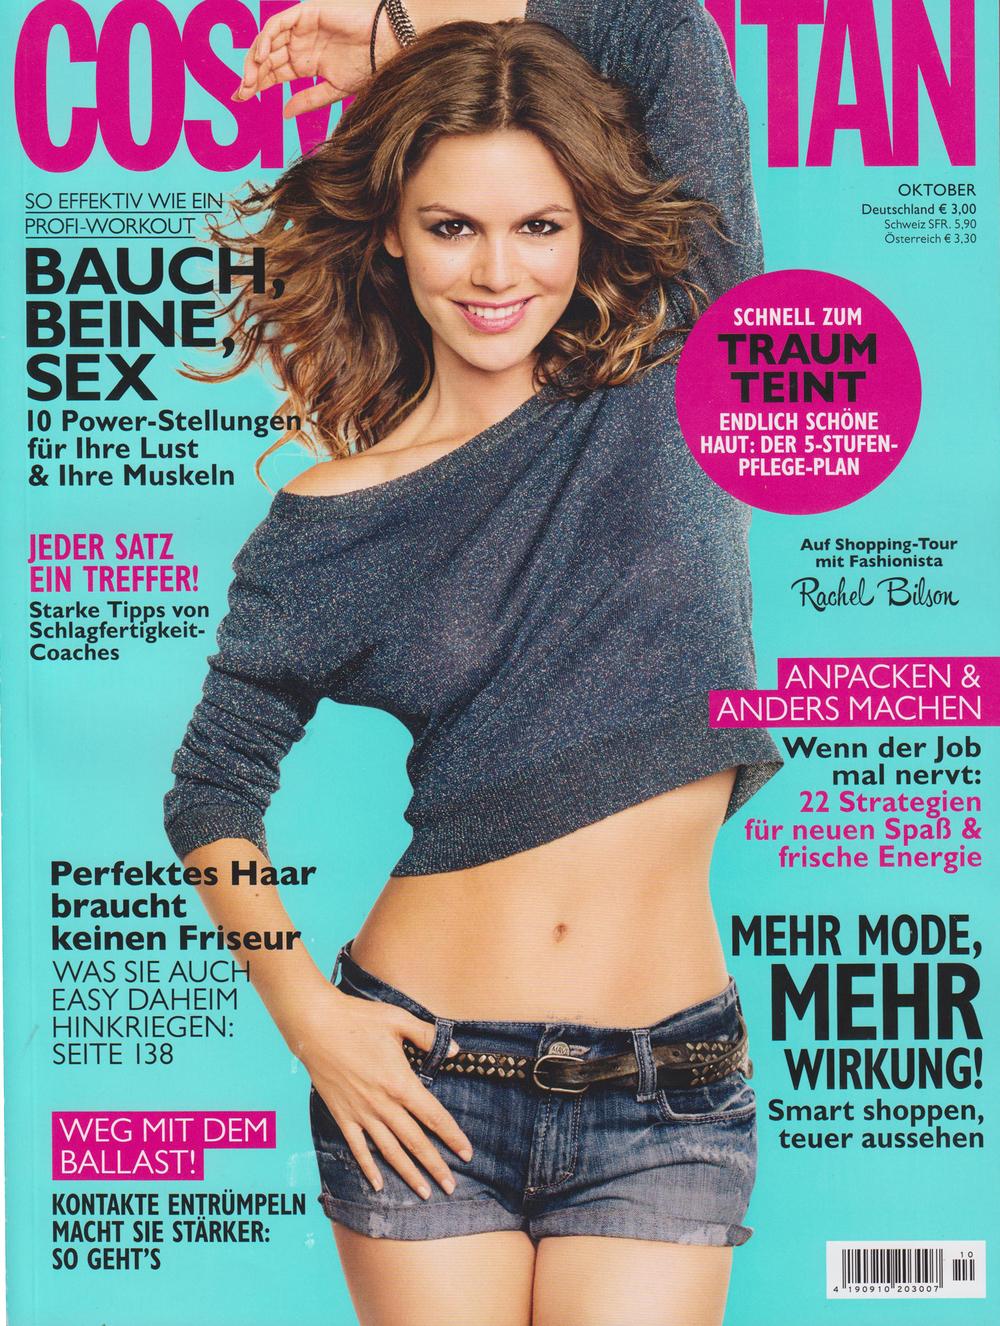 Cosmopolitan_Nr.10_2014_Cover.jpg